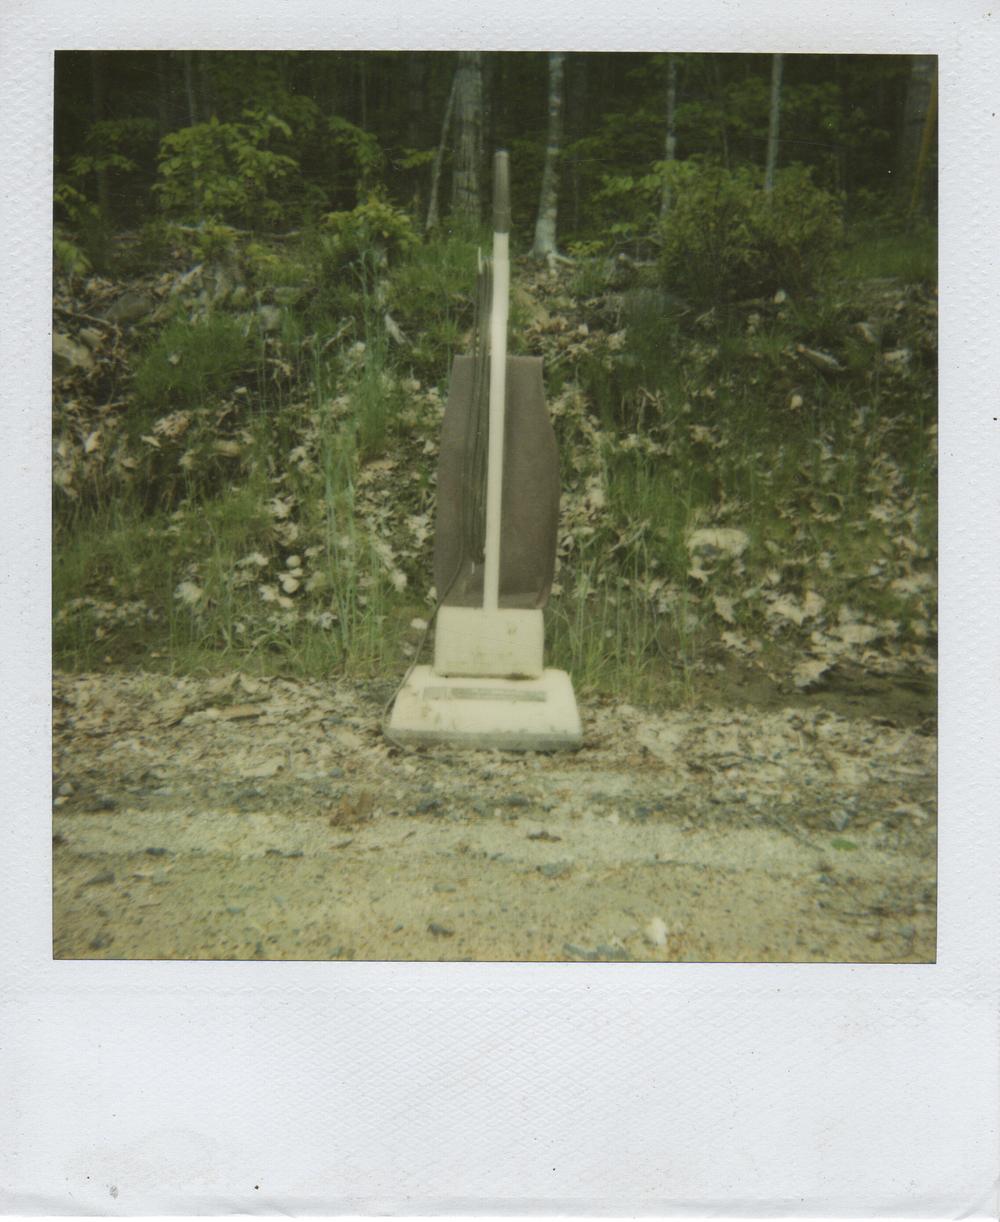 jlaurence-polaroid-003.jpg